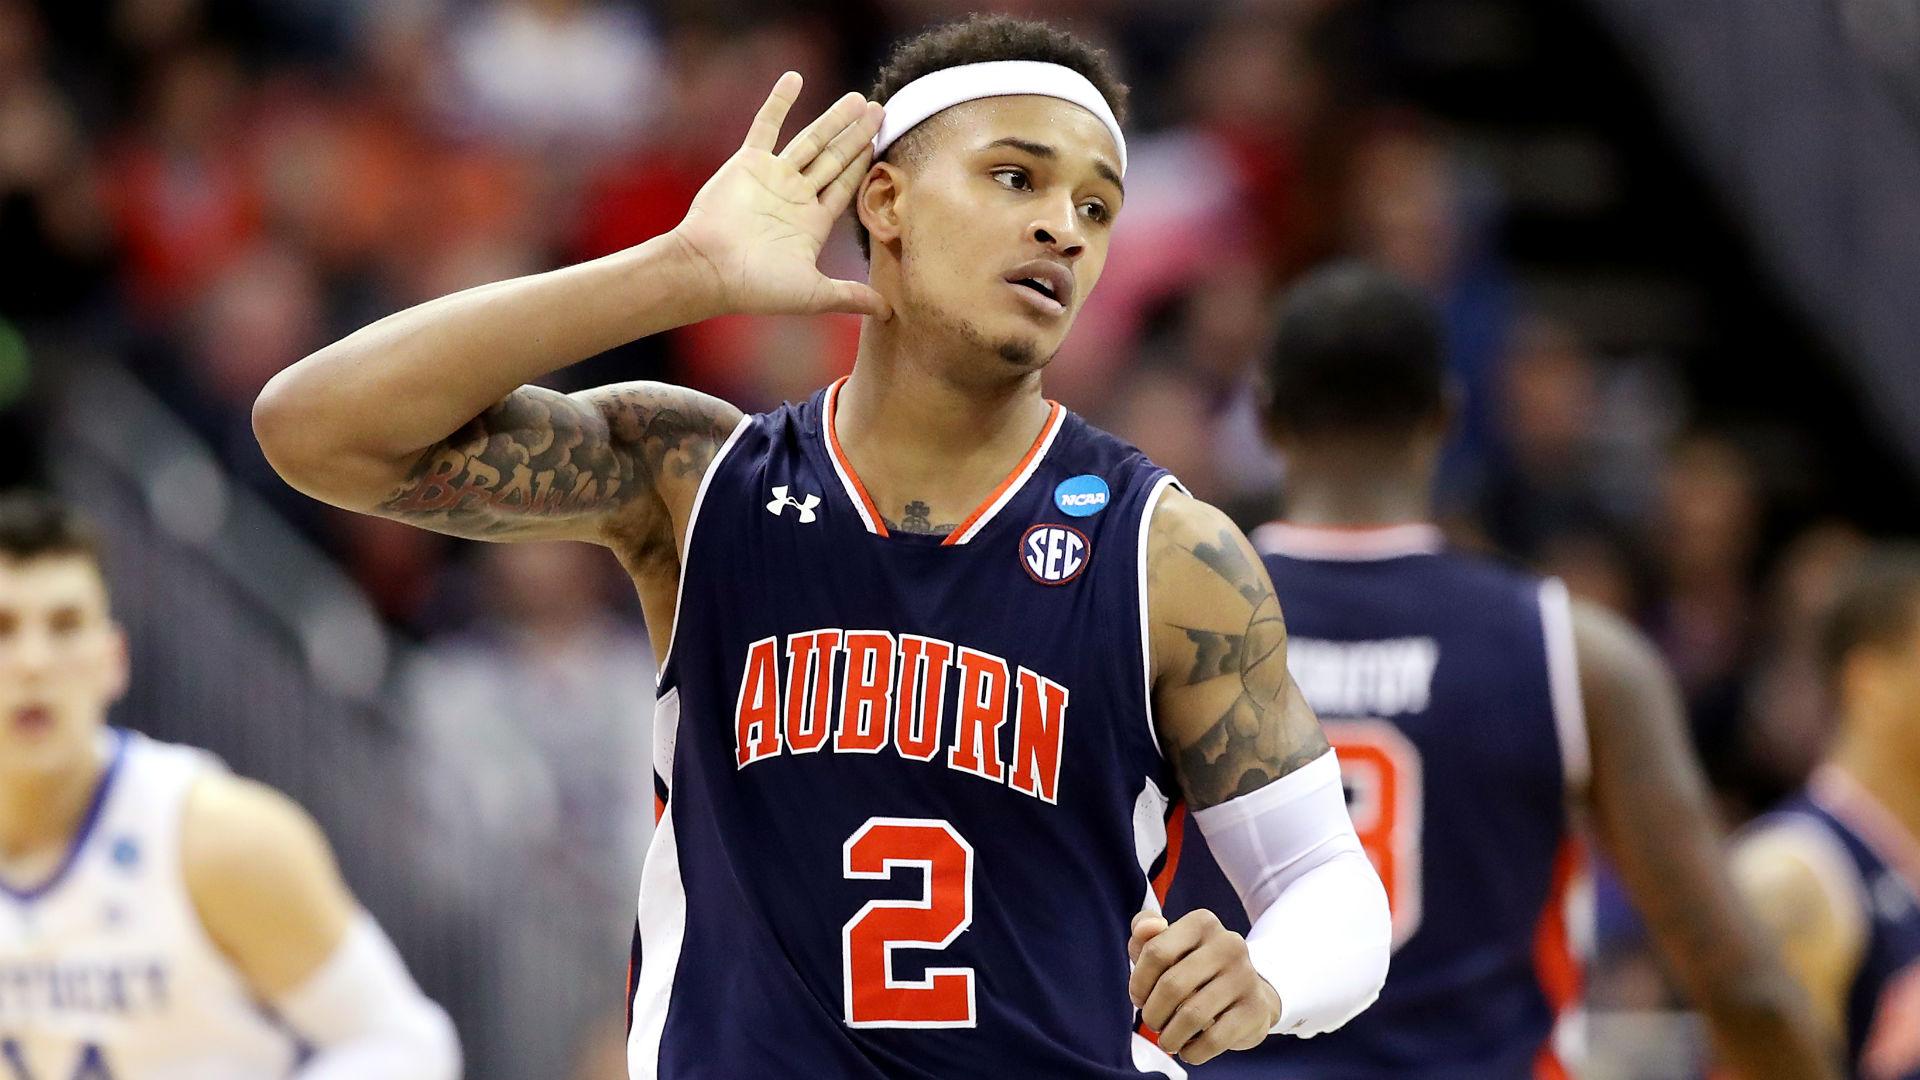 Kentucky Basketball Runs Past Thomas More Highlights Box: Auburn's Bryce Brown, Jared Harper Lead Tigers Past